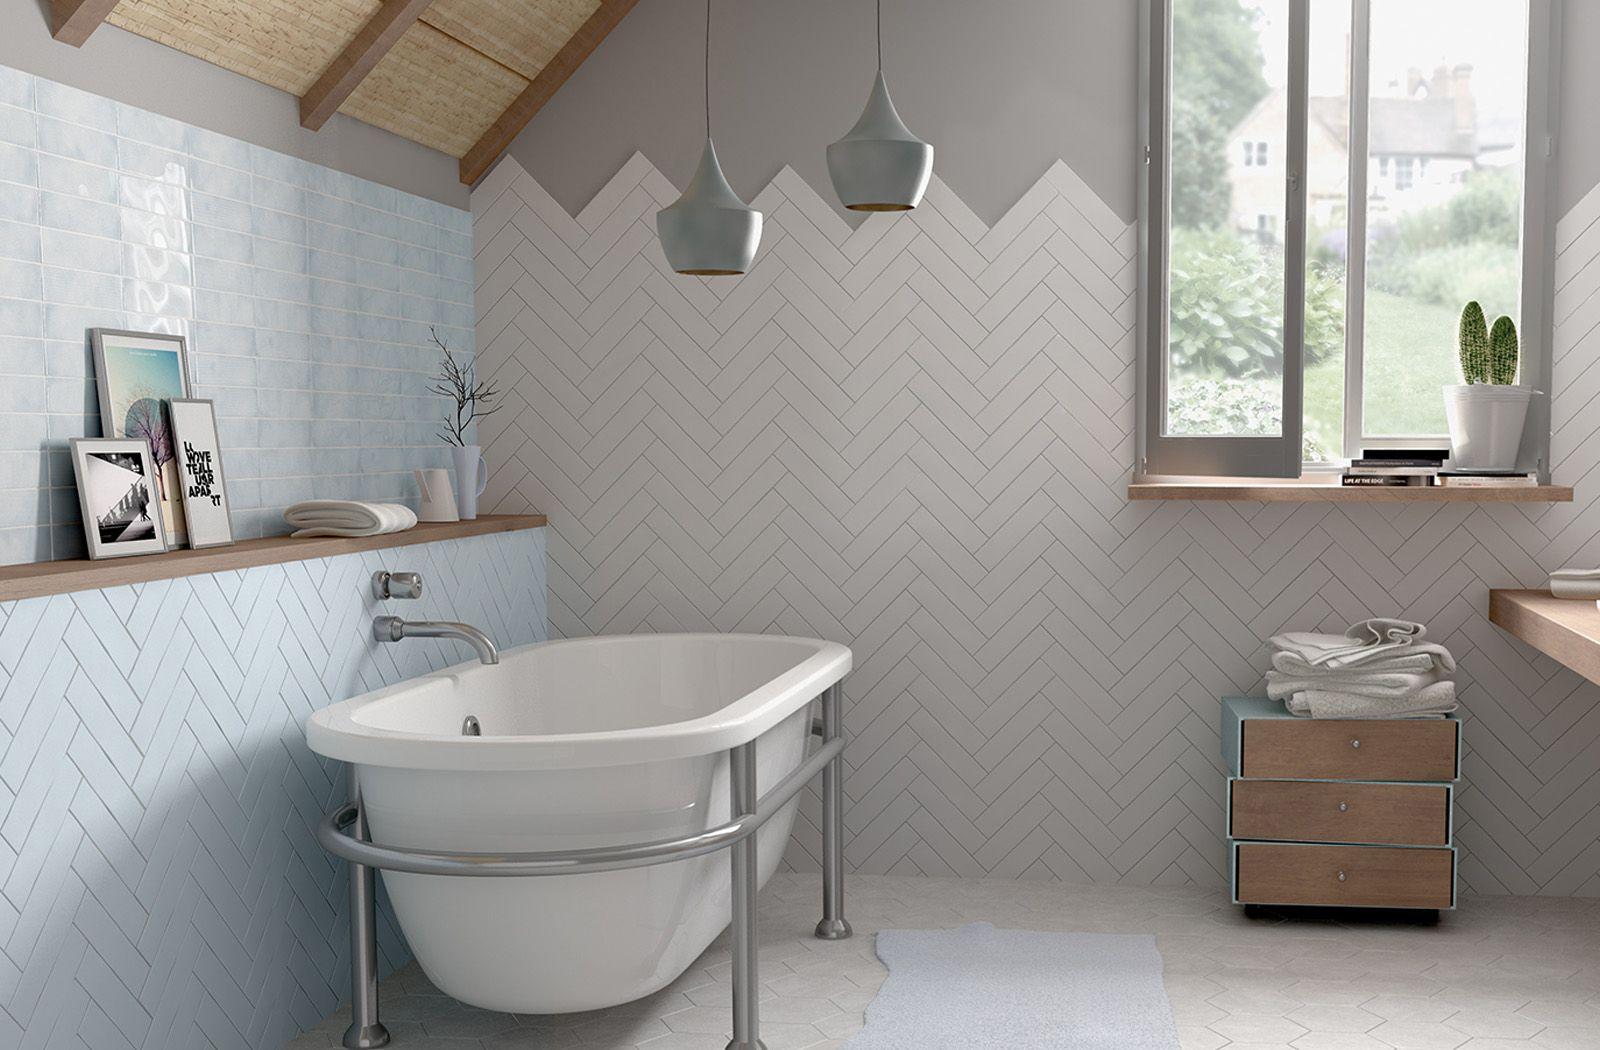 Matt Decorative Wall Tile In Herringbone Pattern Featuring Dunas Blue Moon White From Equipe Ceramicas